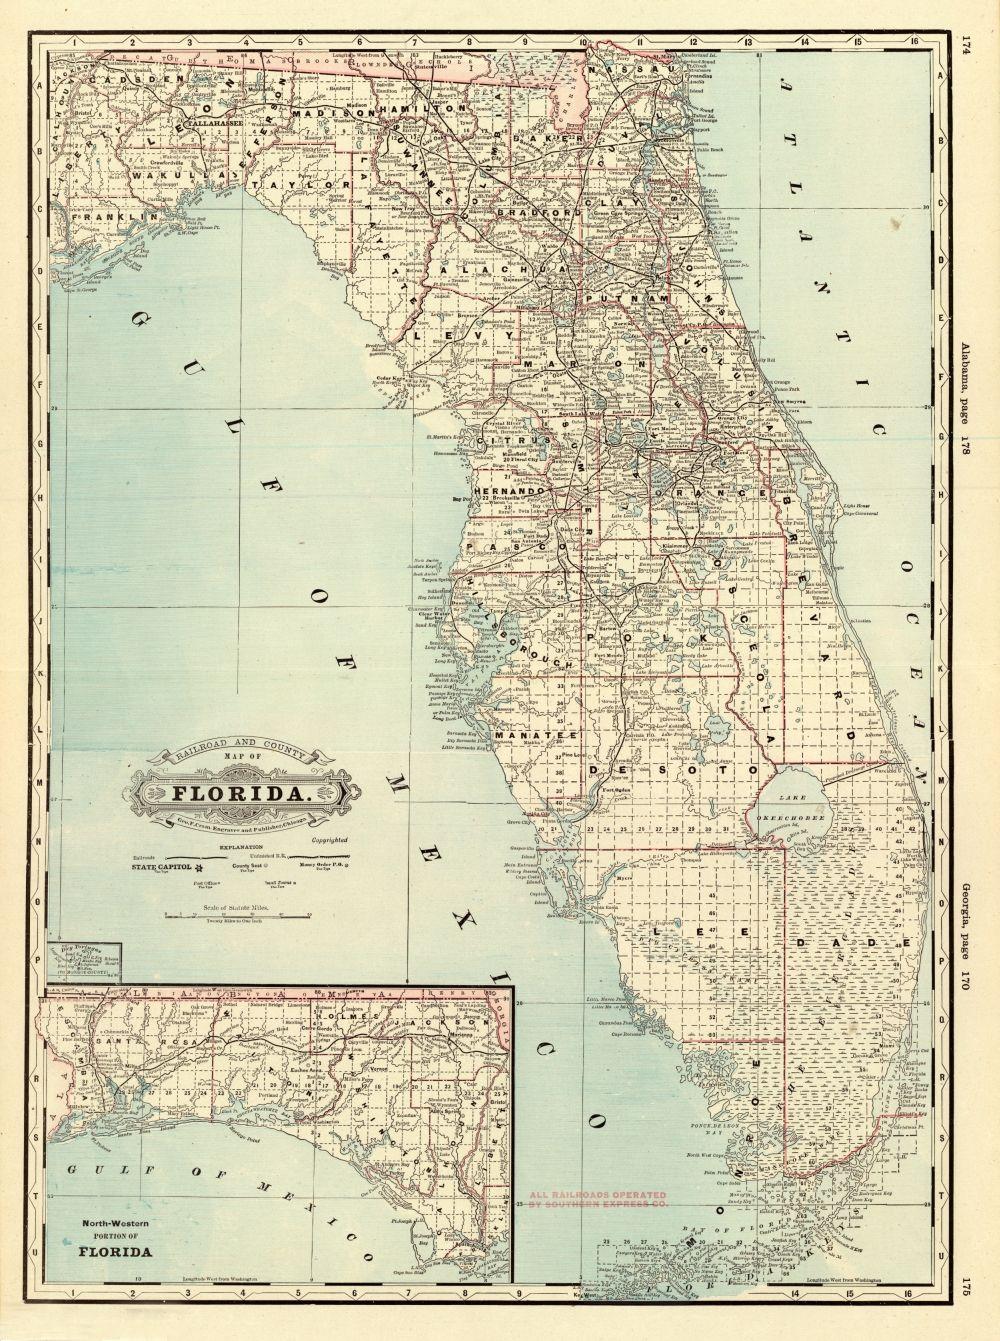 Plant City Florida Map.Florida Memory County Map Of Florida 1885 History Of Plant City